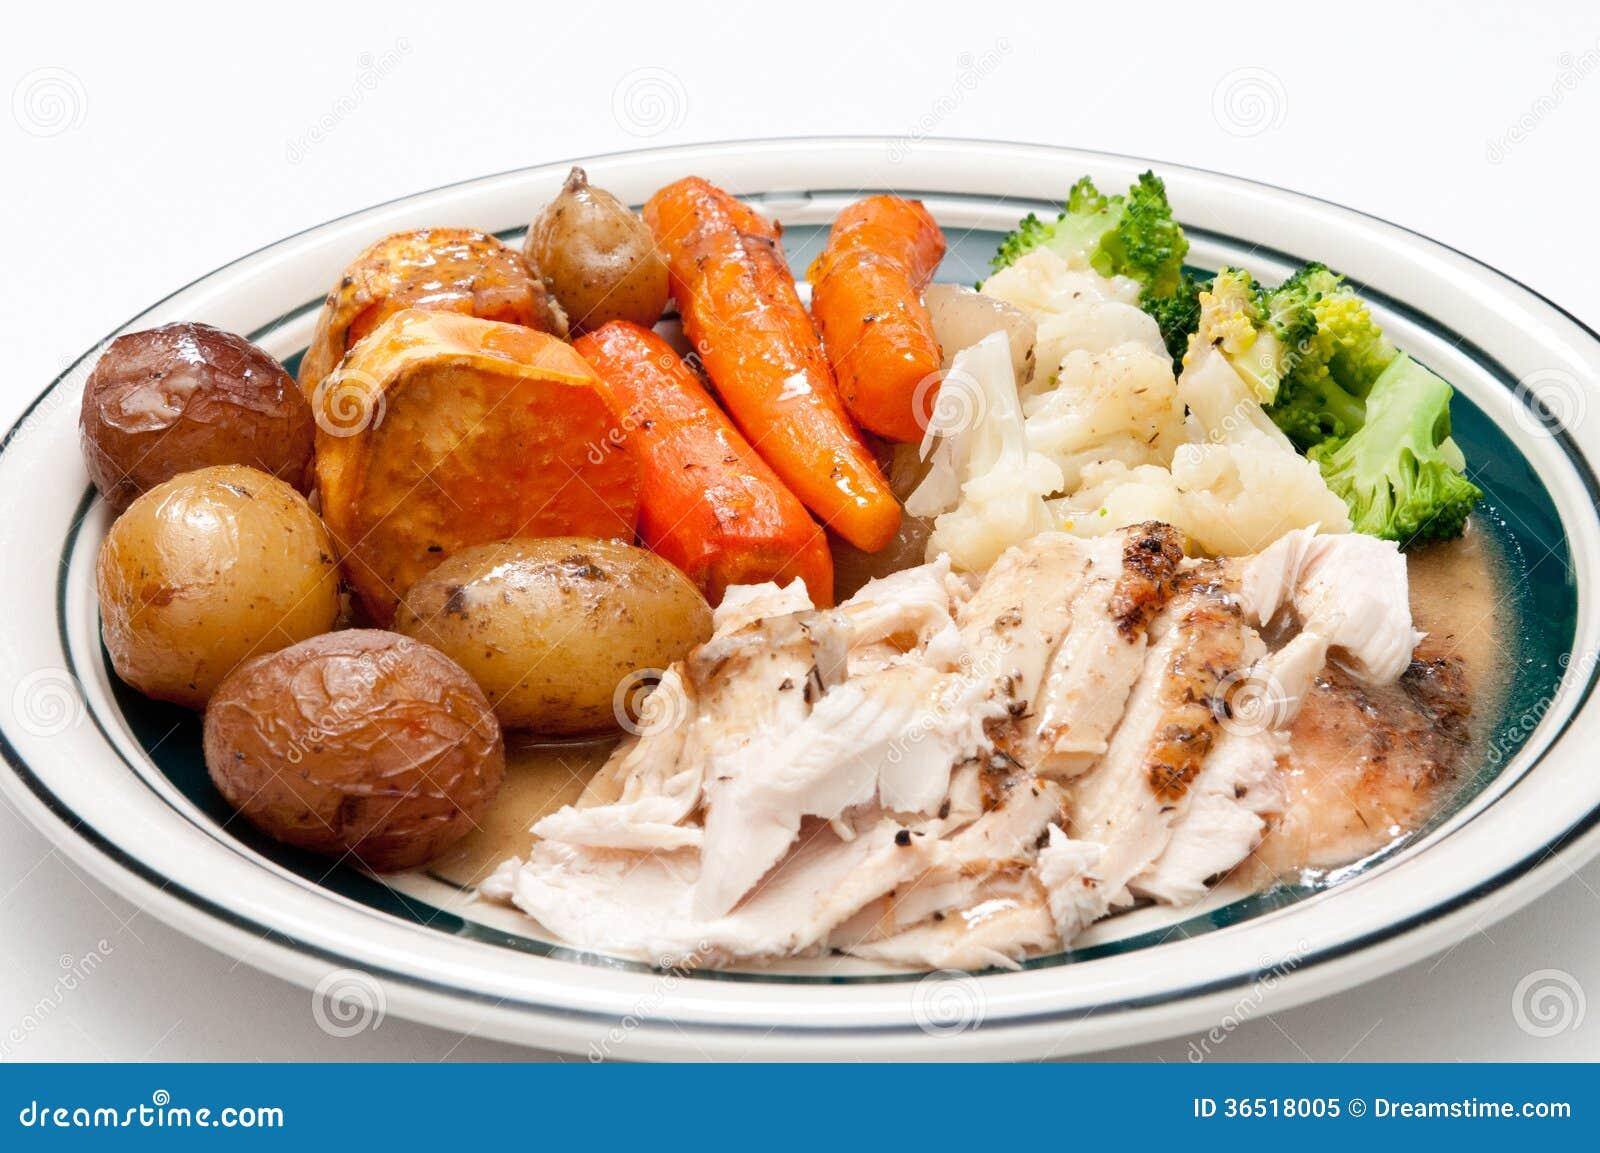 Turkey Breast with Vegetable Gravy